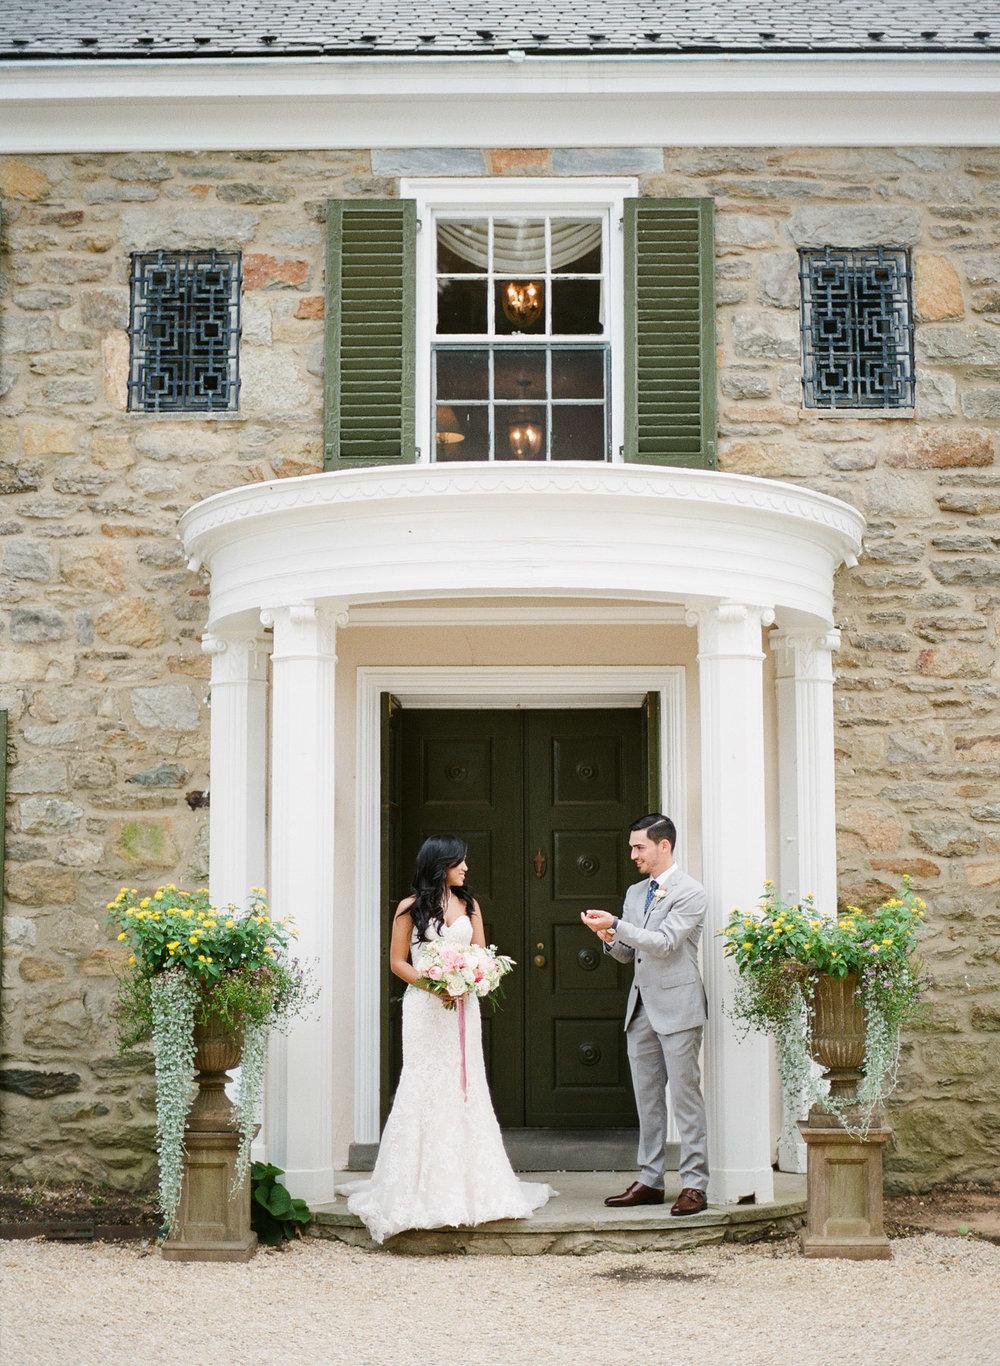 Virginia-Film-Photographer-Wedding-37.jpg